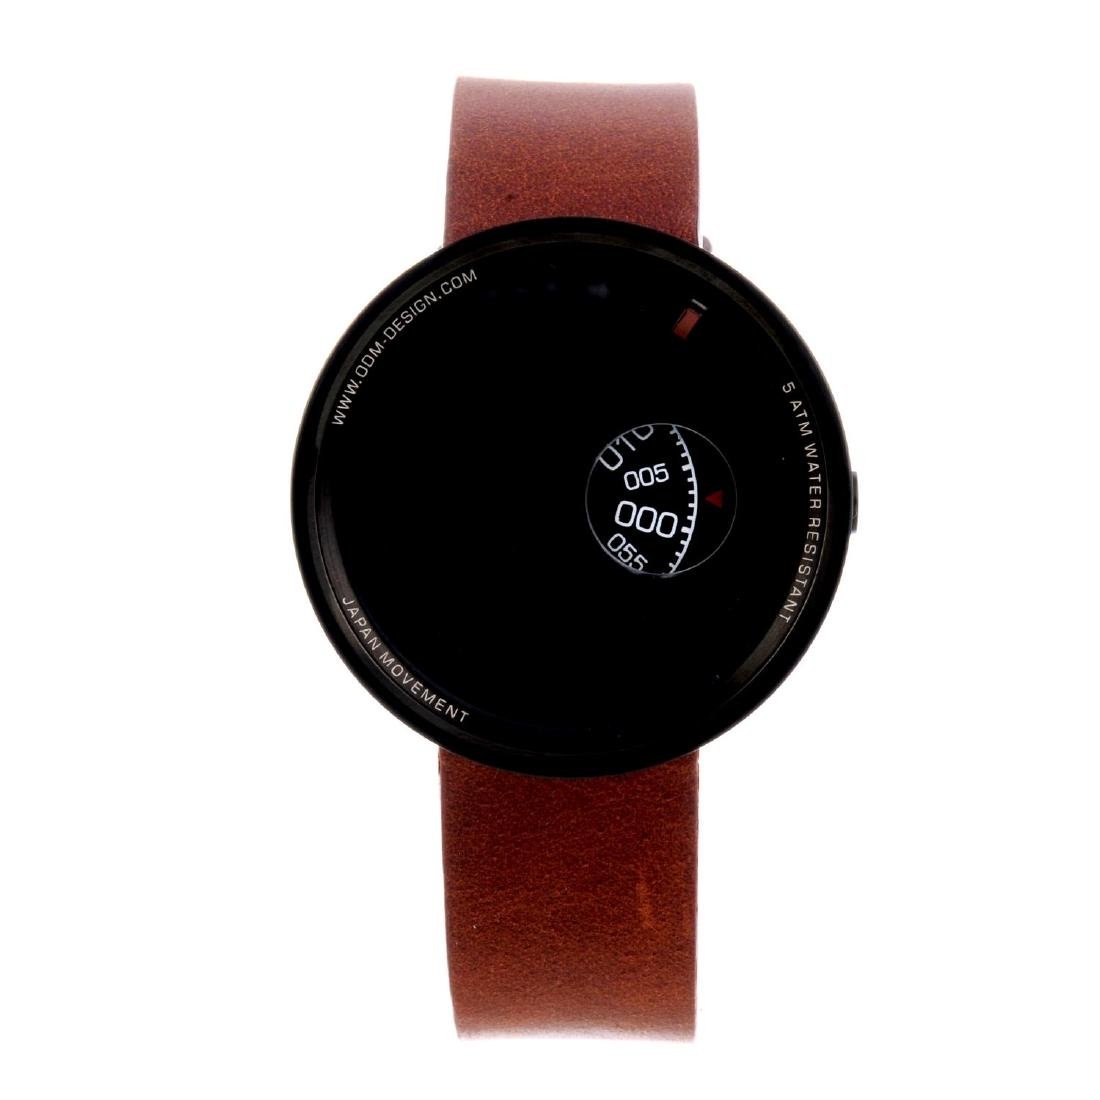 O.D.M - a gentleman's M-6 wrist watch. PVD-treated